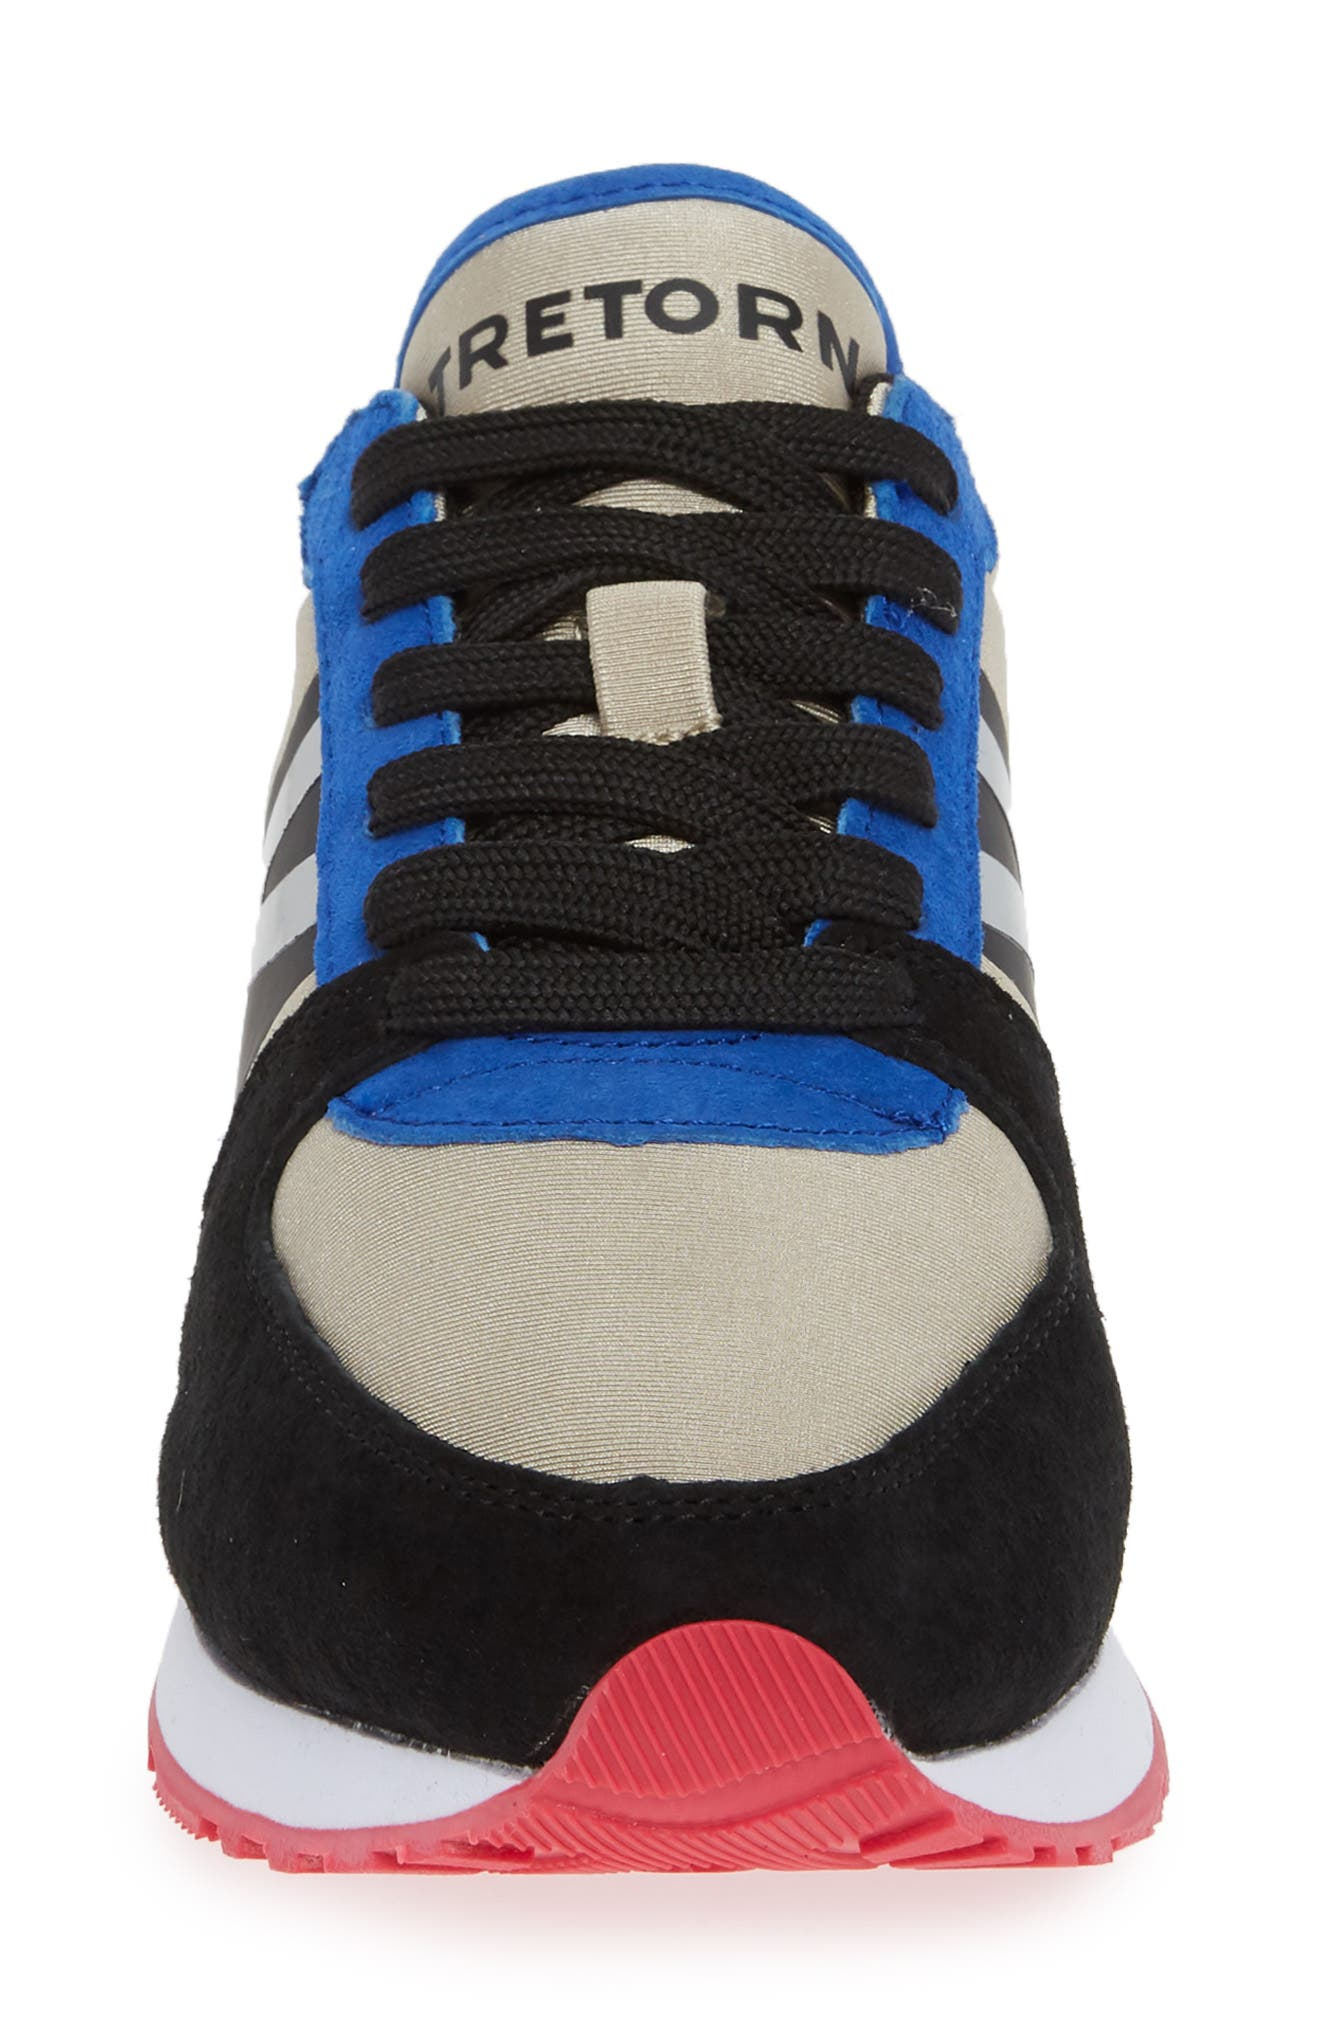 TRETORN,                             Loyola3 Sneaker,                             Alternate thumbnail 4, color,                             GLACIER GREY/ MARSHMALLOW